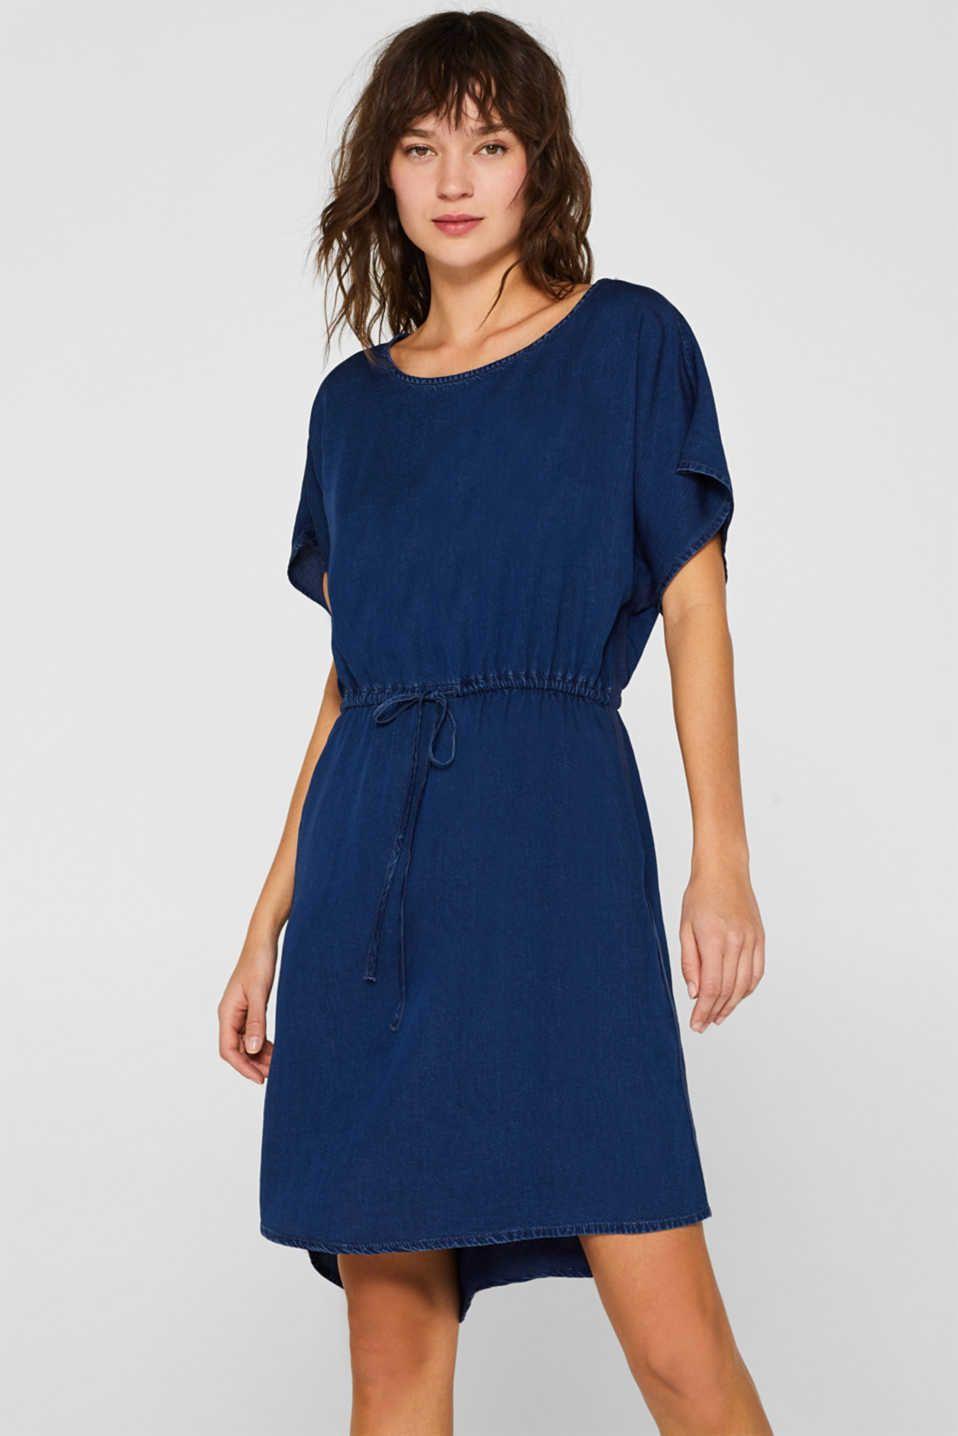 Esprit - Kleid in Jeans-Optik, 19% Lyocell  Komplette outfits